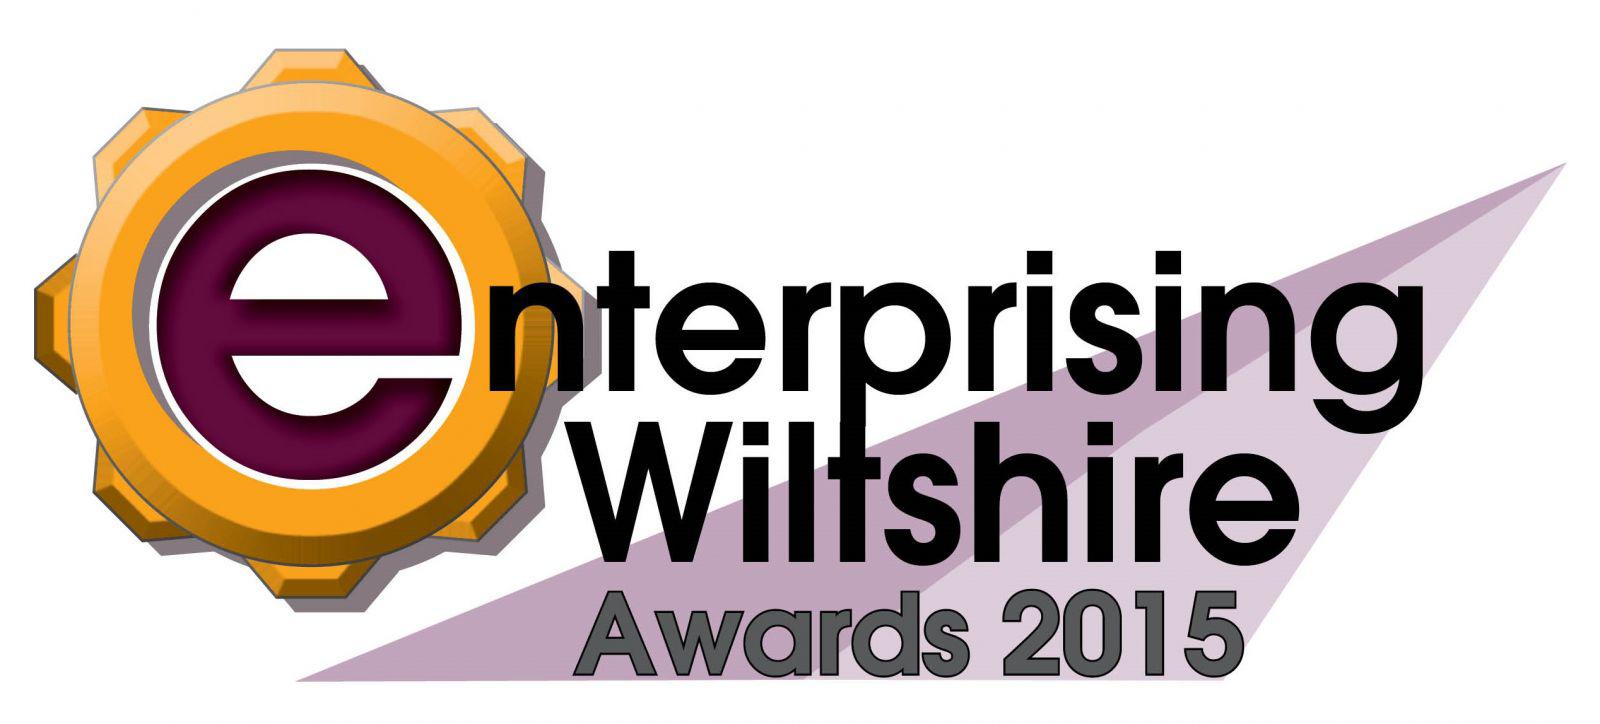 Enterprise Small Business Award